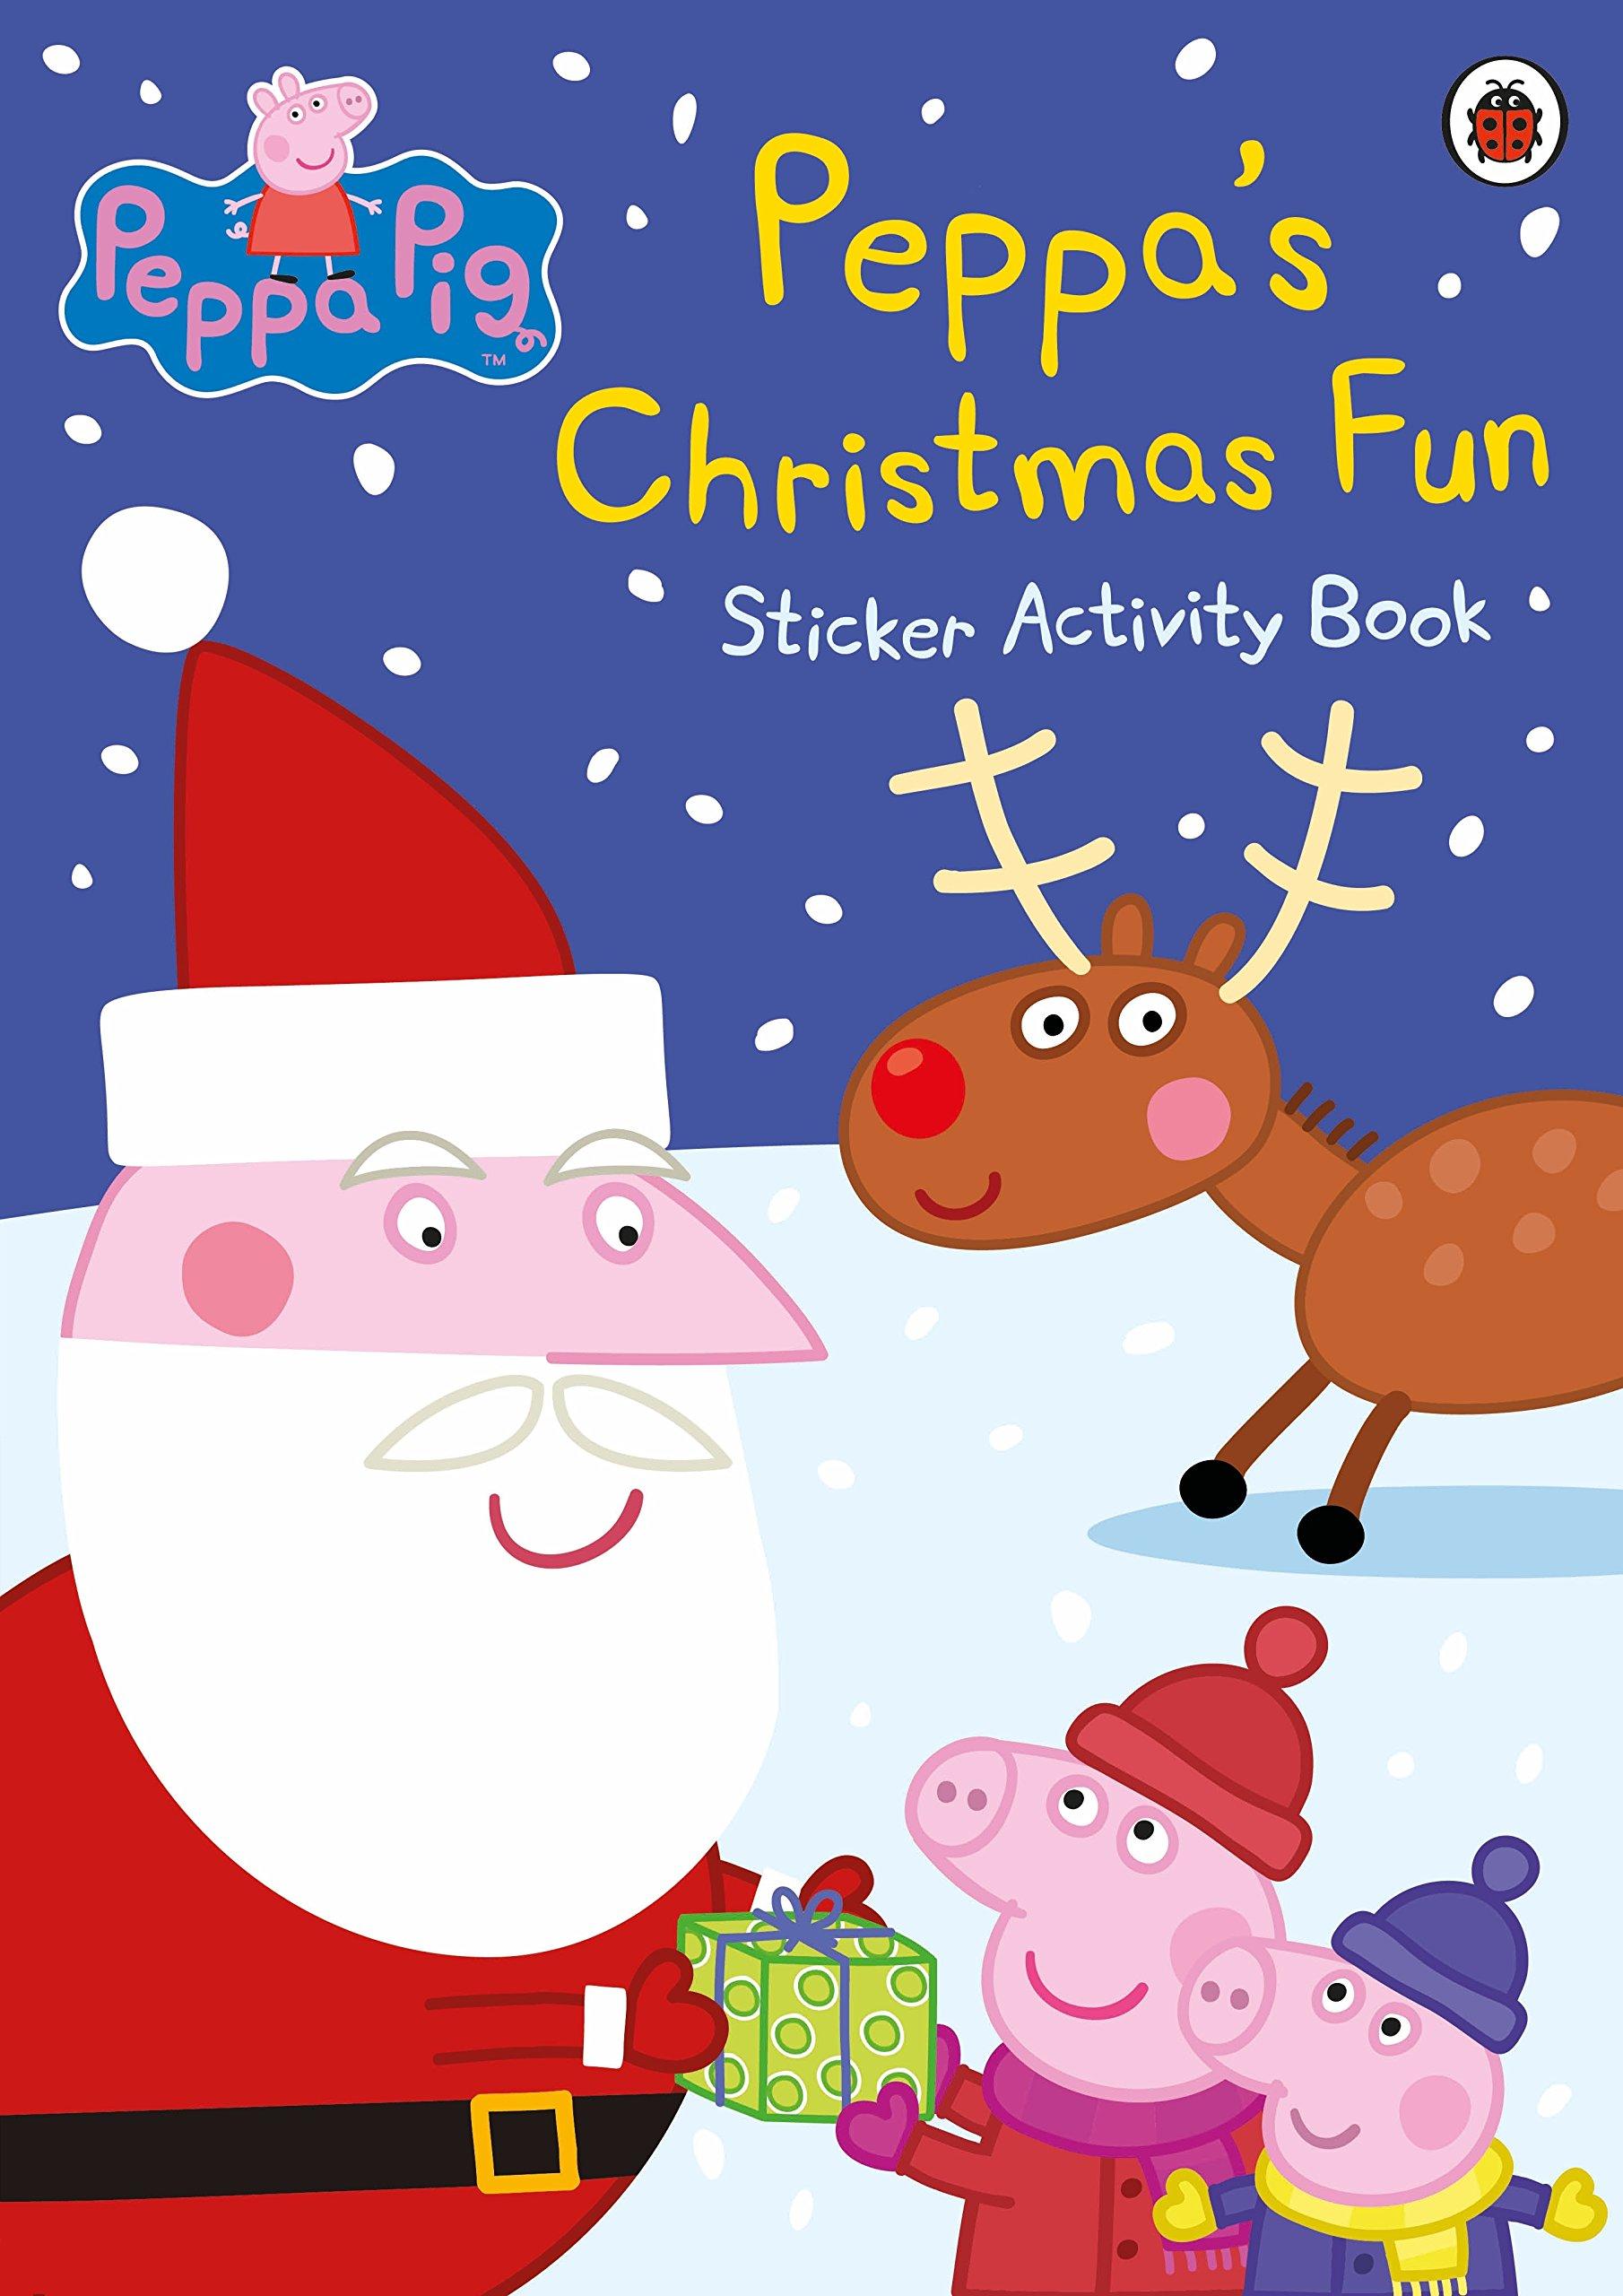 Peppa Pig Christmas.Peppa Pig Peppa S Christmas Fun Sticker Activity Book